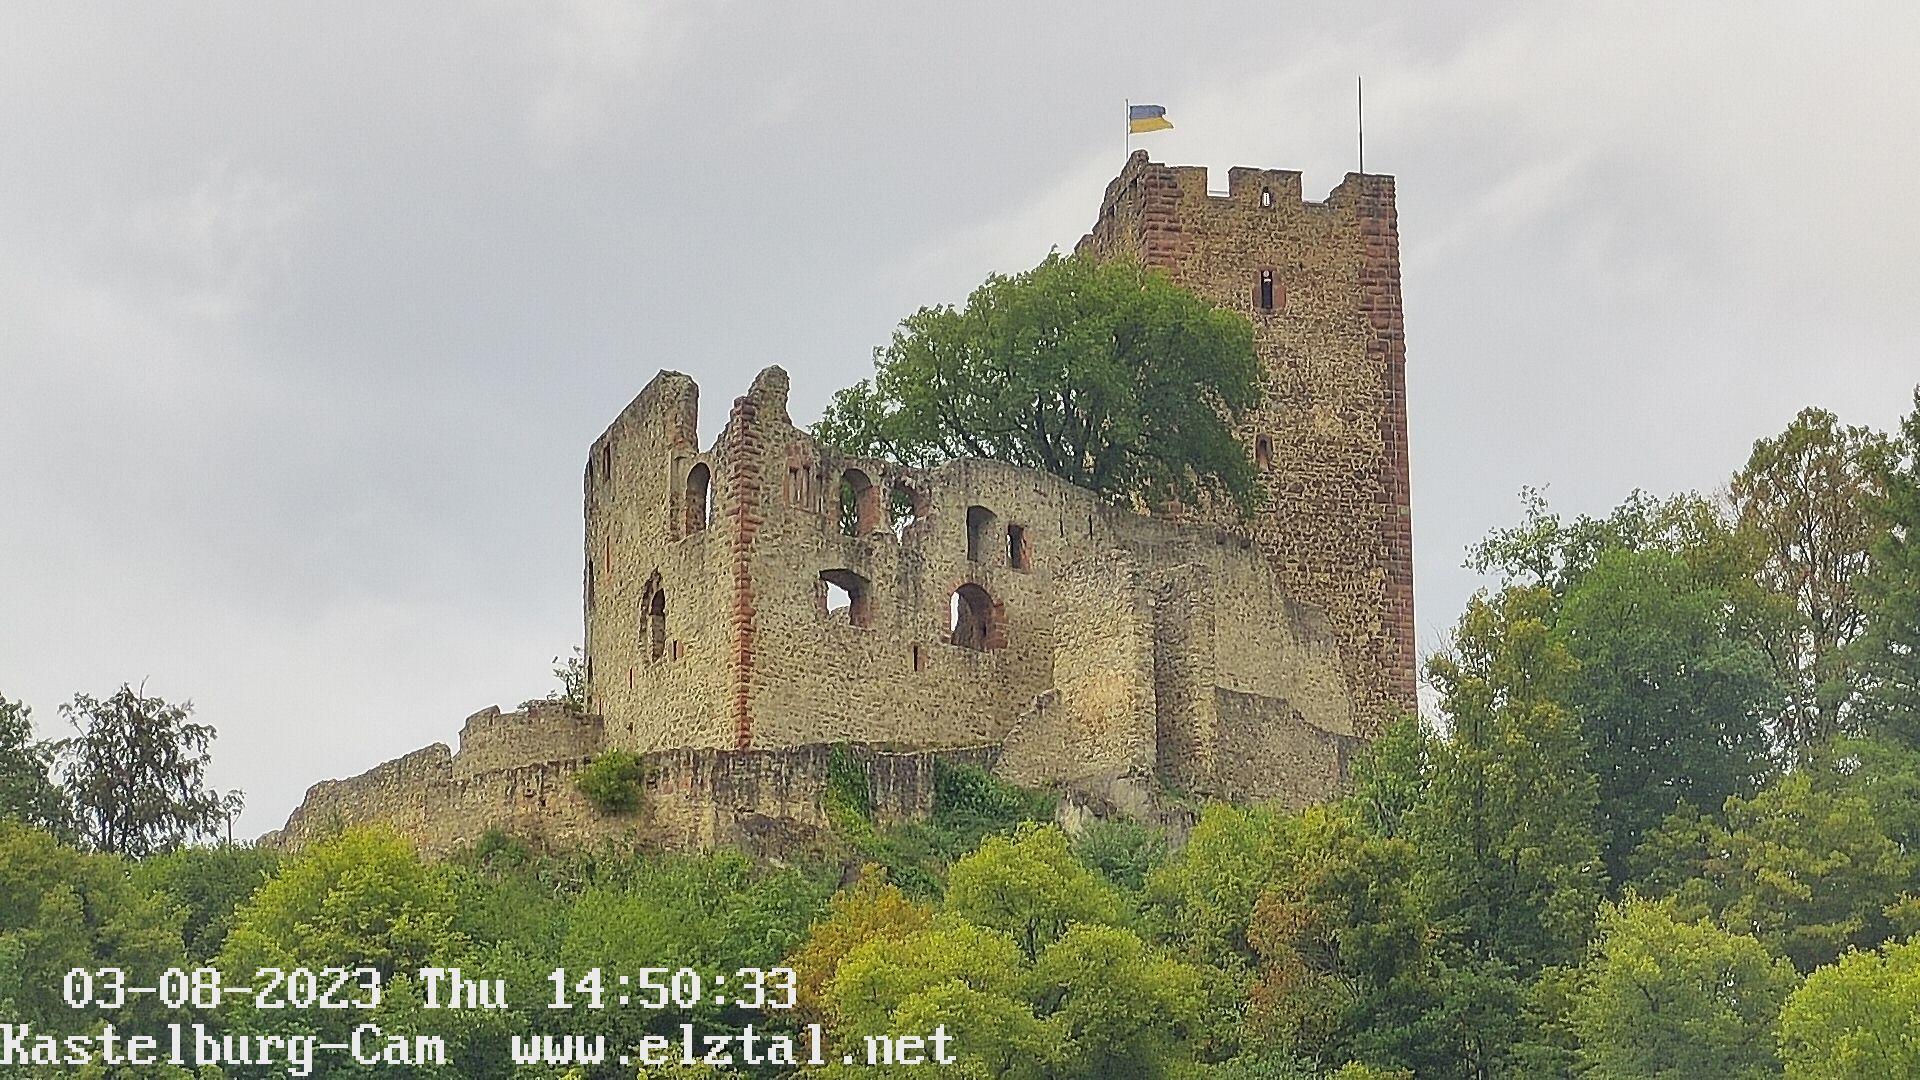 Waldkirch Wed. 14:55